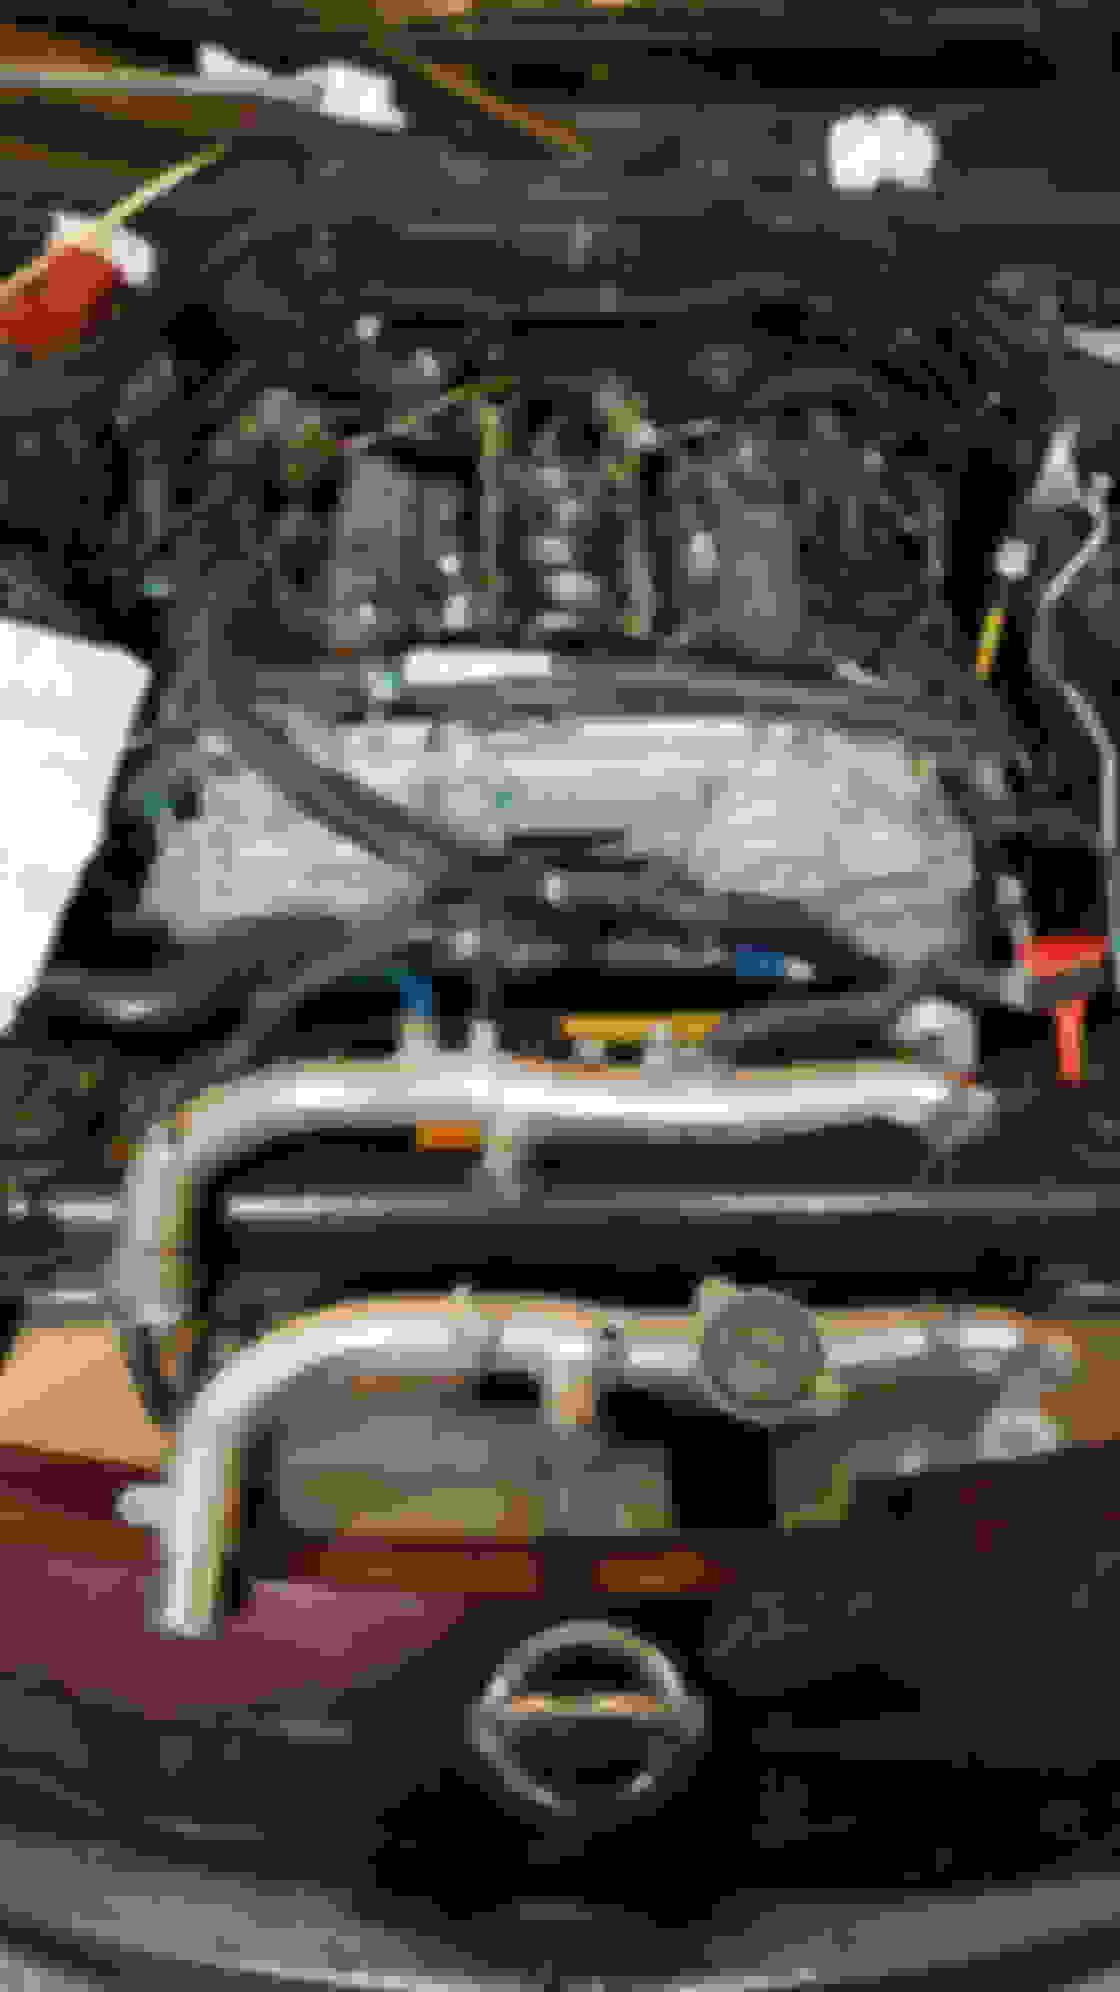 DIY - Pathfinder Mod - MY350Z COM - Nissan 350Z and 370Z